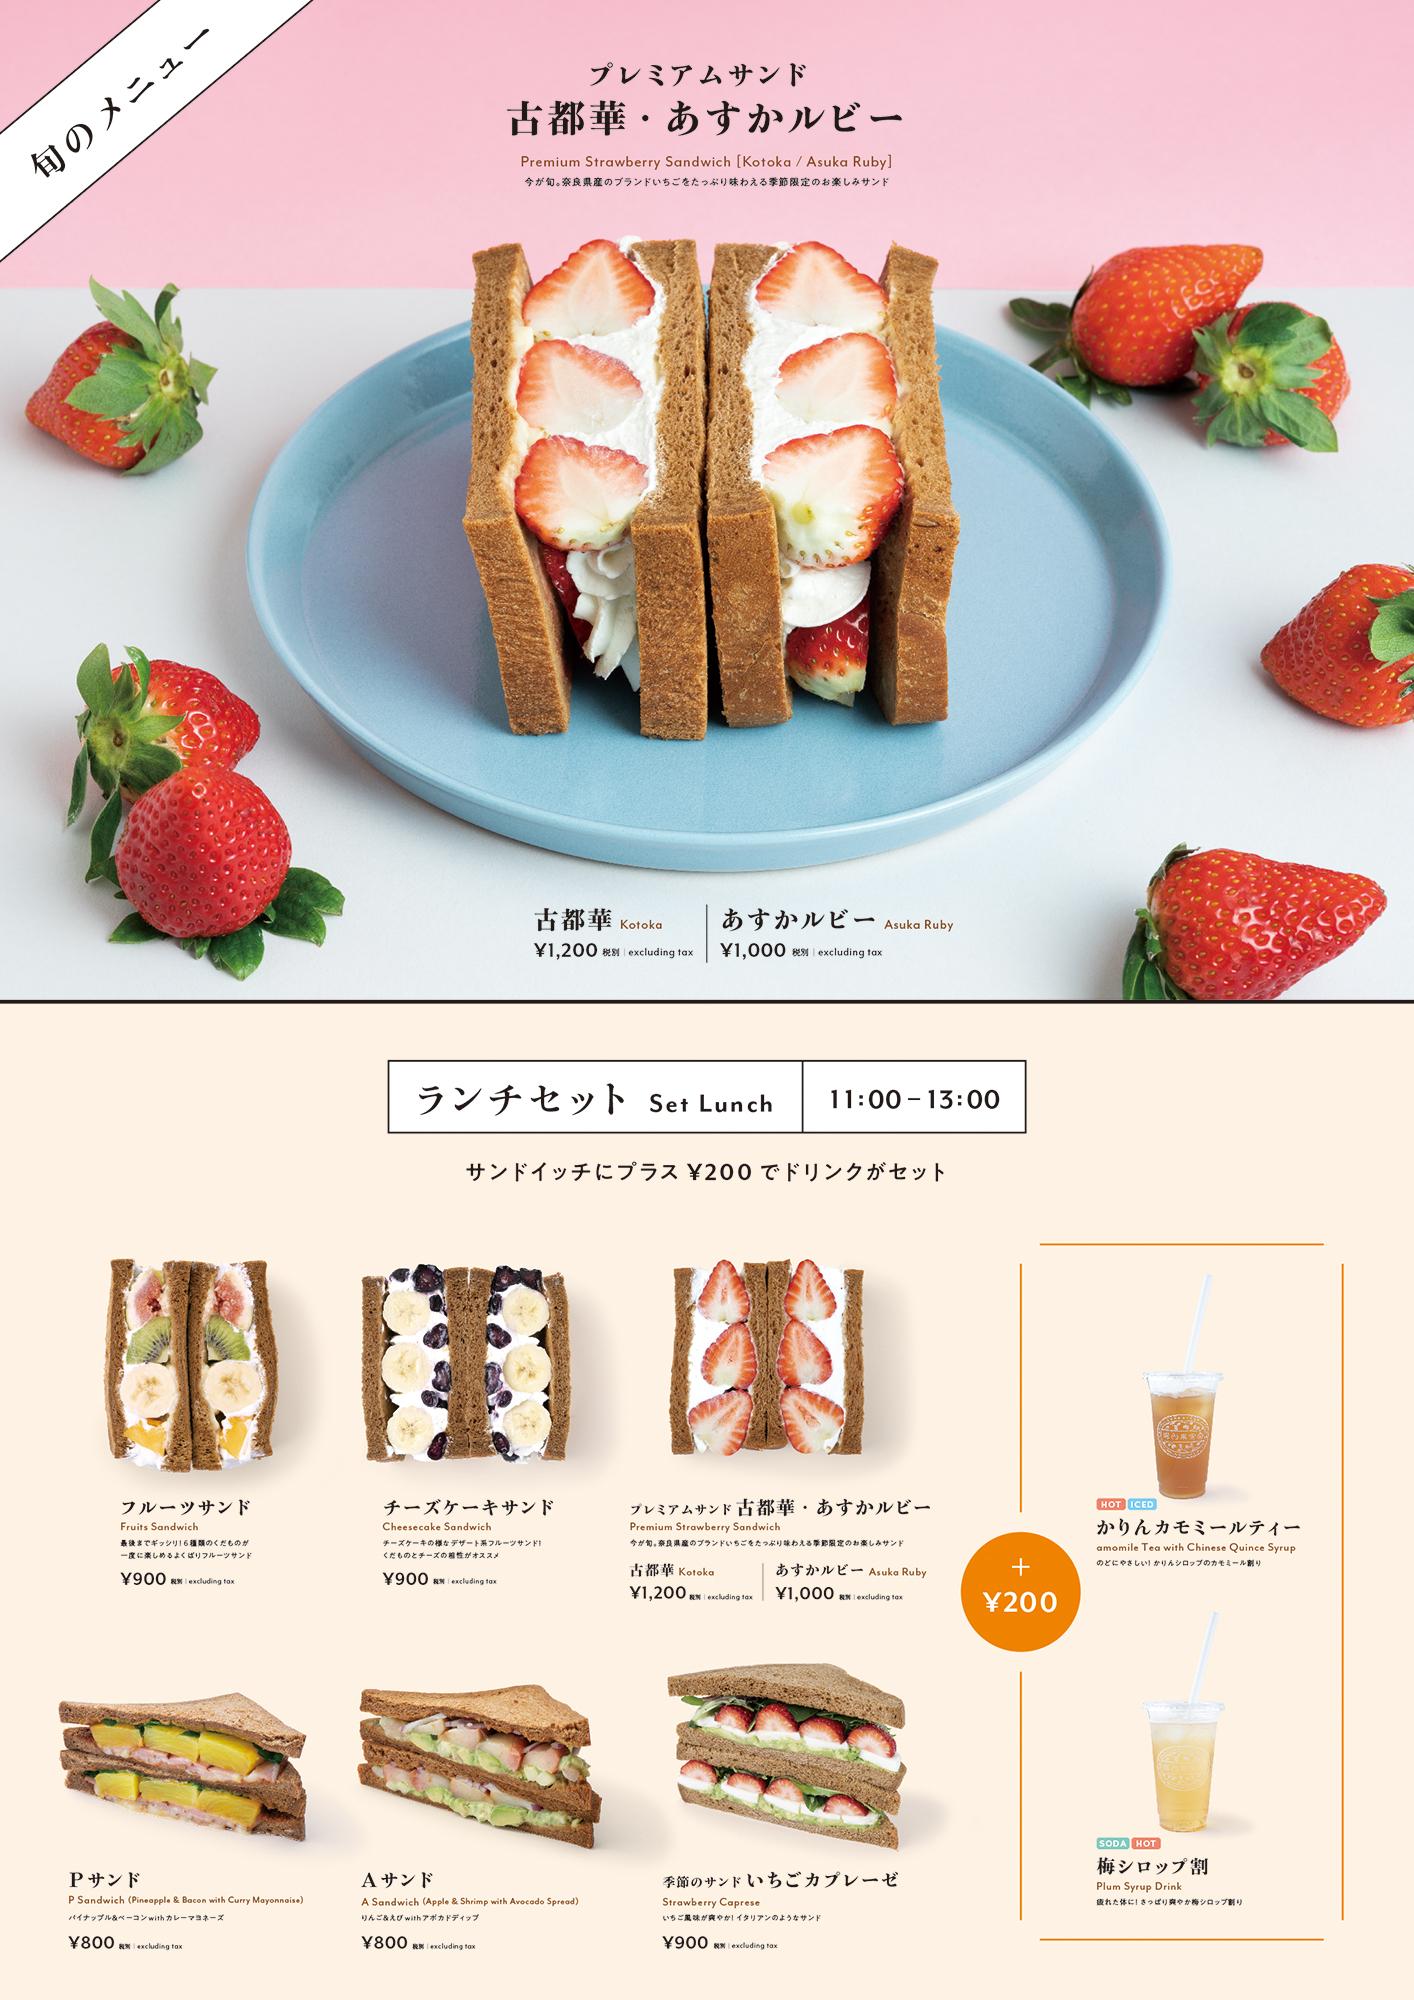 horiuchi_menu_shun_2019spring.jpg